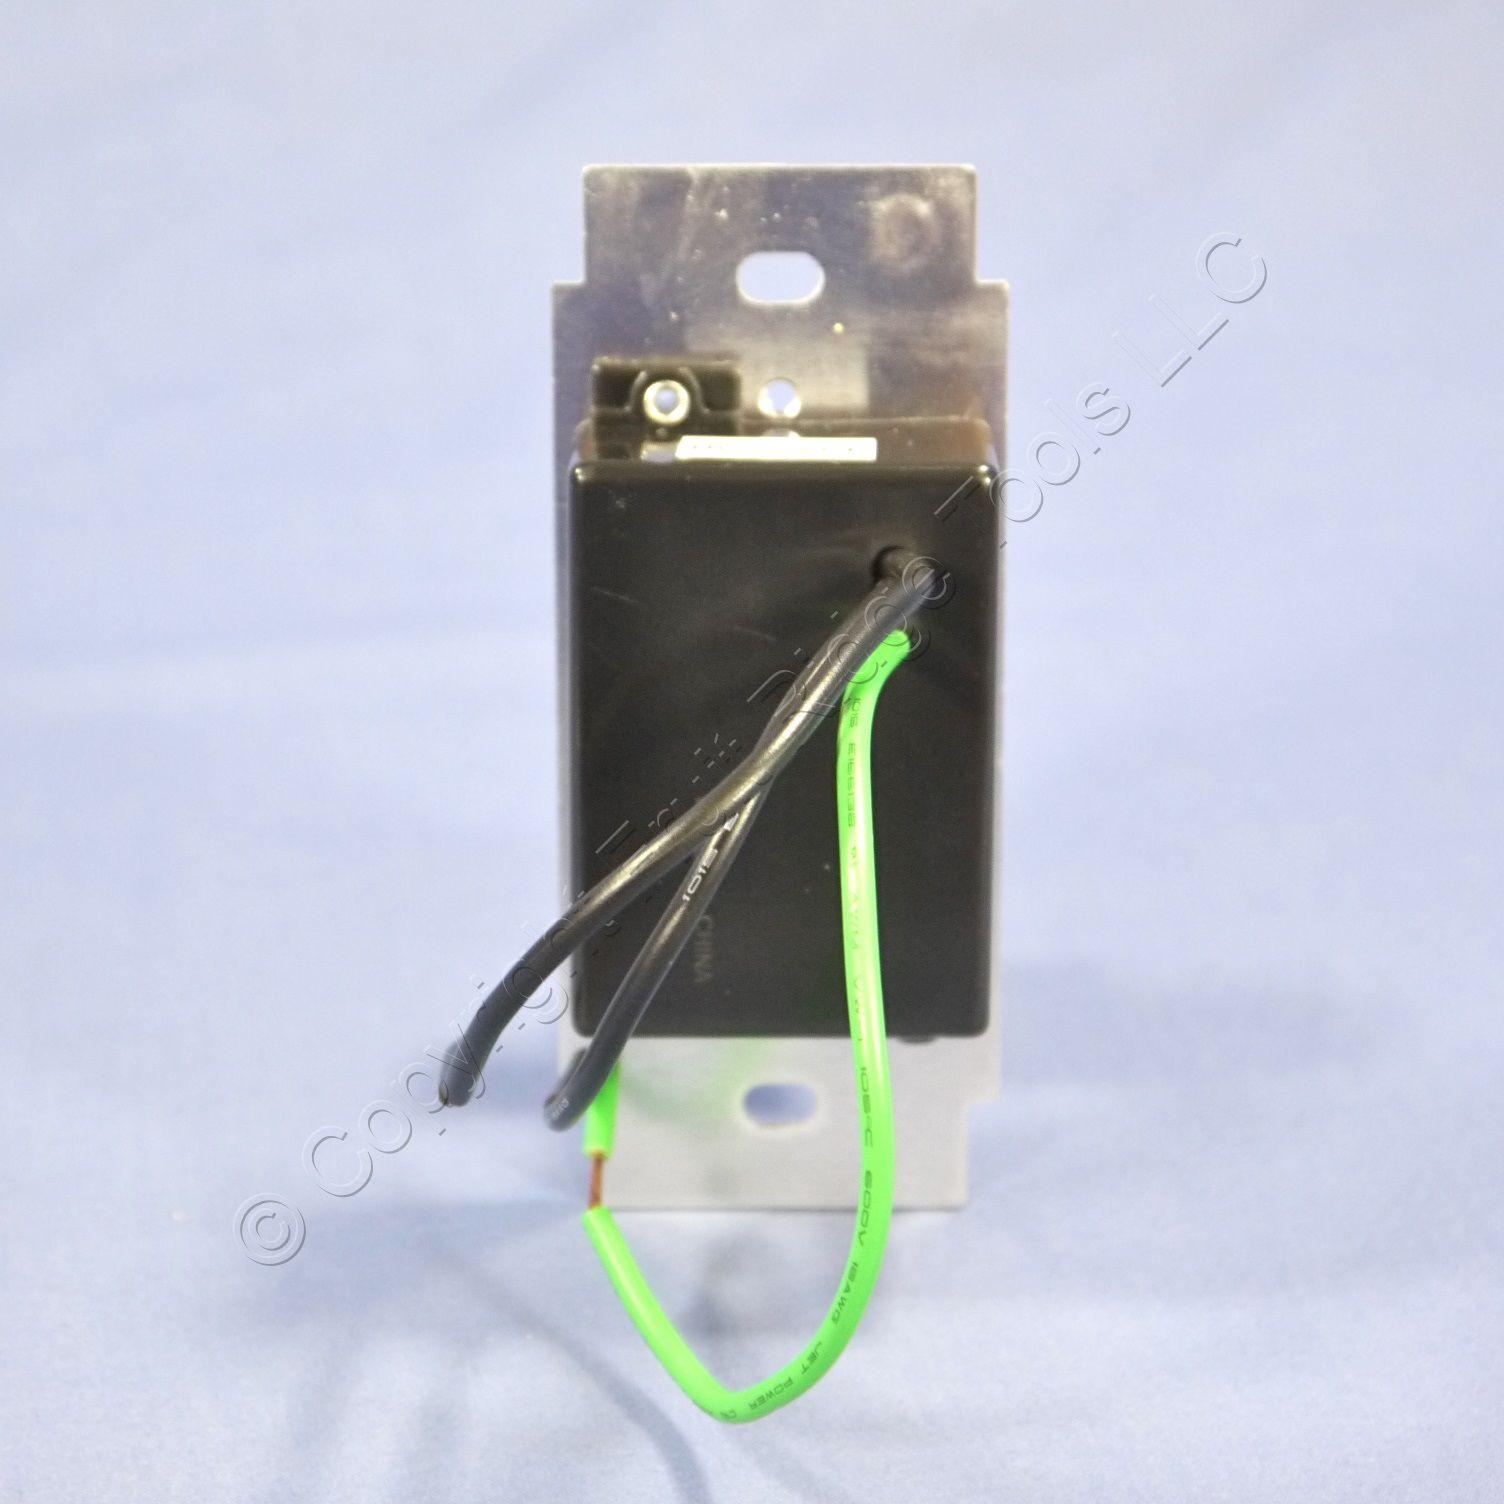 Leviton 6842 Dimmer Wiring Diagram - Wiring Diagram